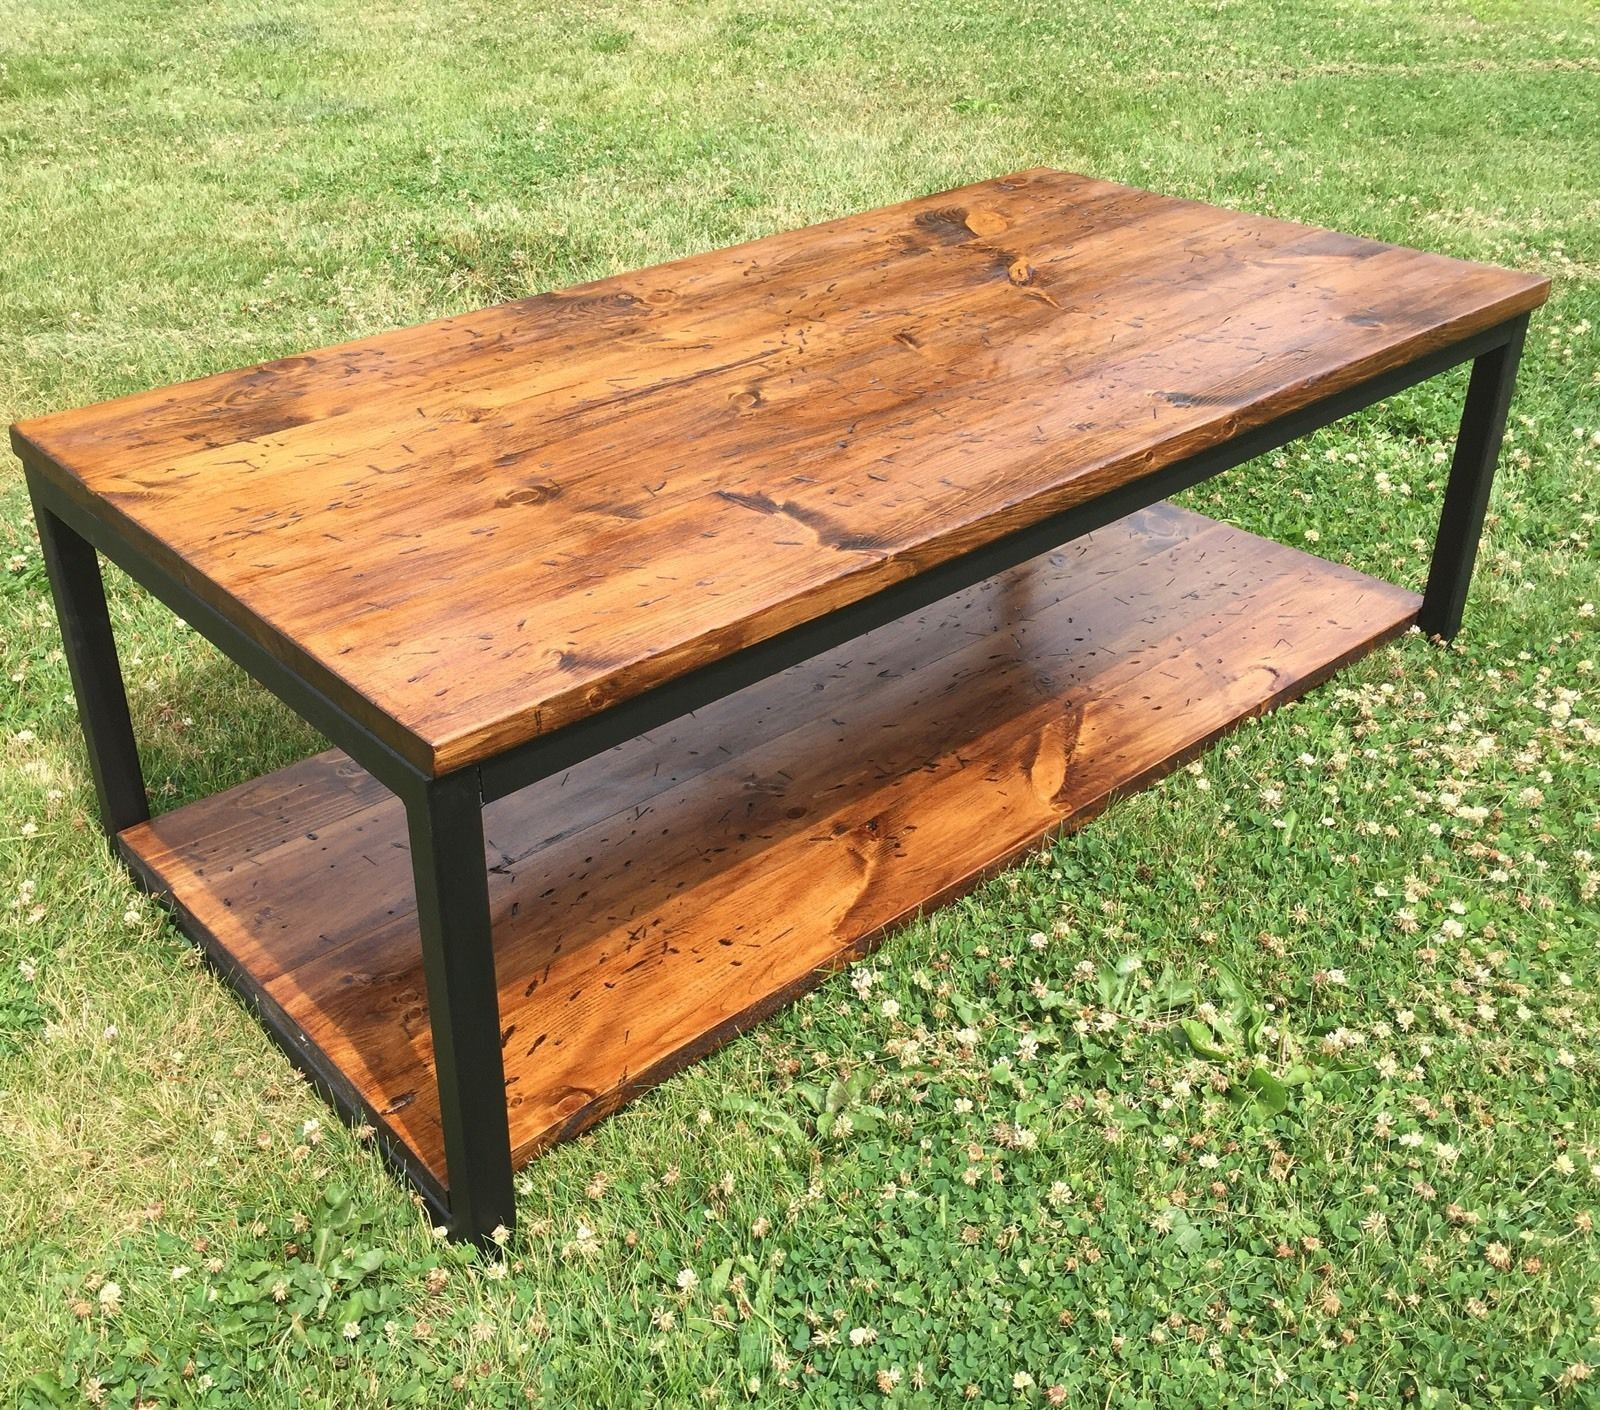 Rustic Wood And Metal Coffee Tables: Rustic Wood And Metal Coffee, Cocktail Table